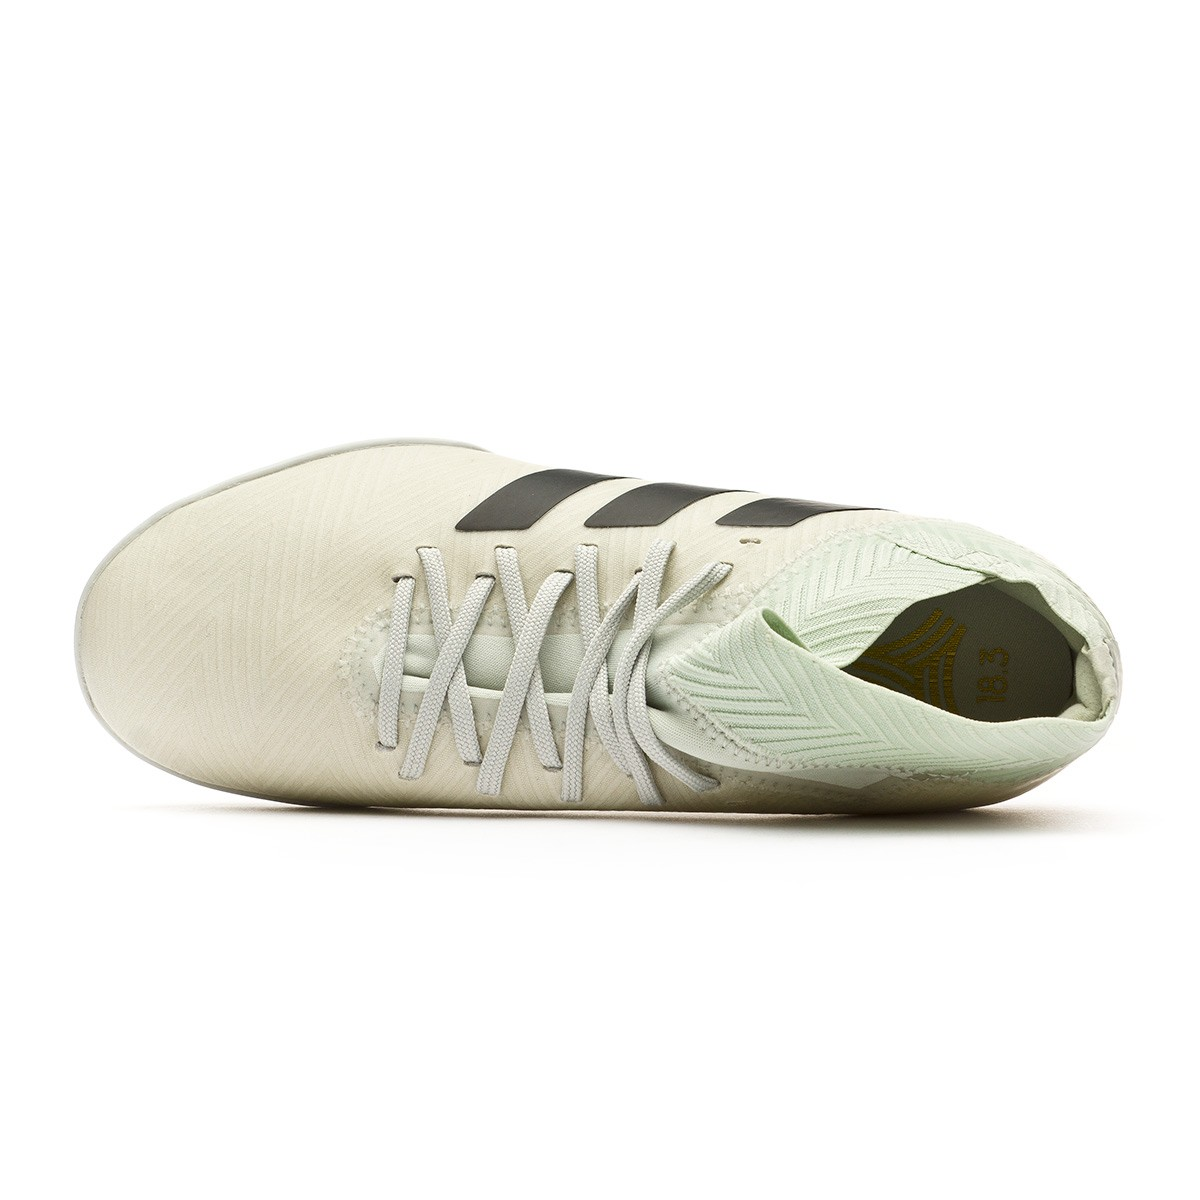 Scarpe adidas Nemeziz Tango 18.3 Turf Junior